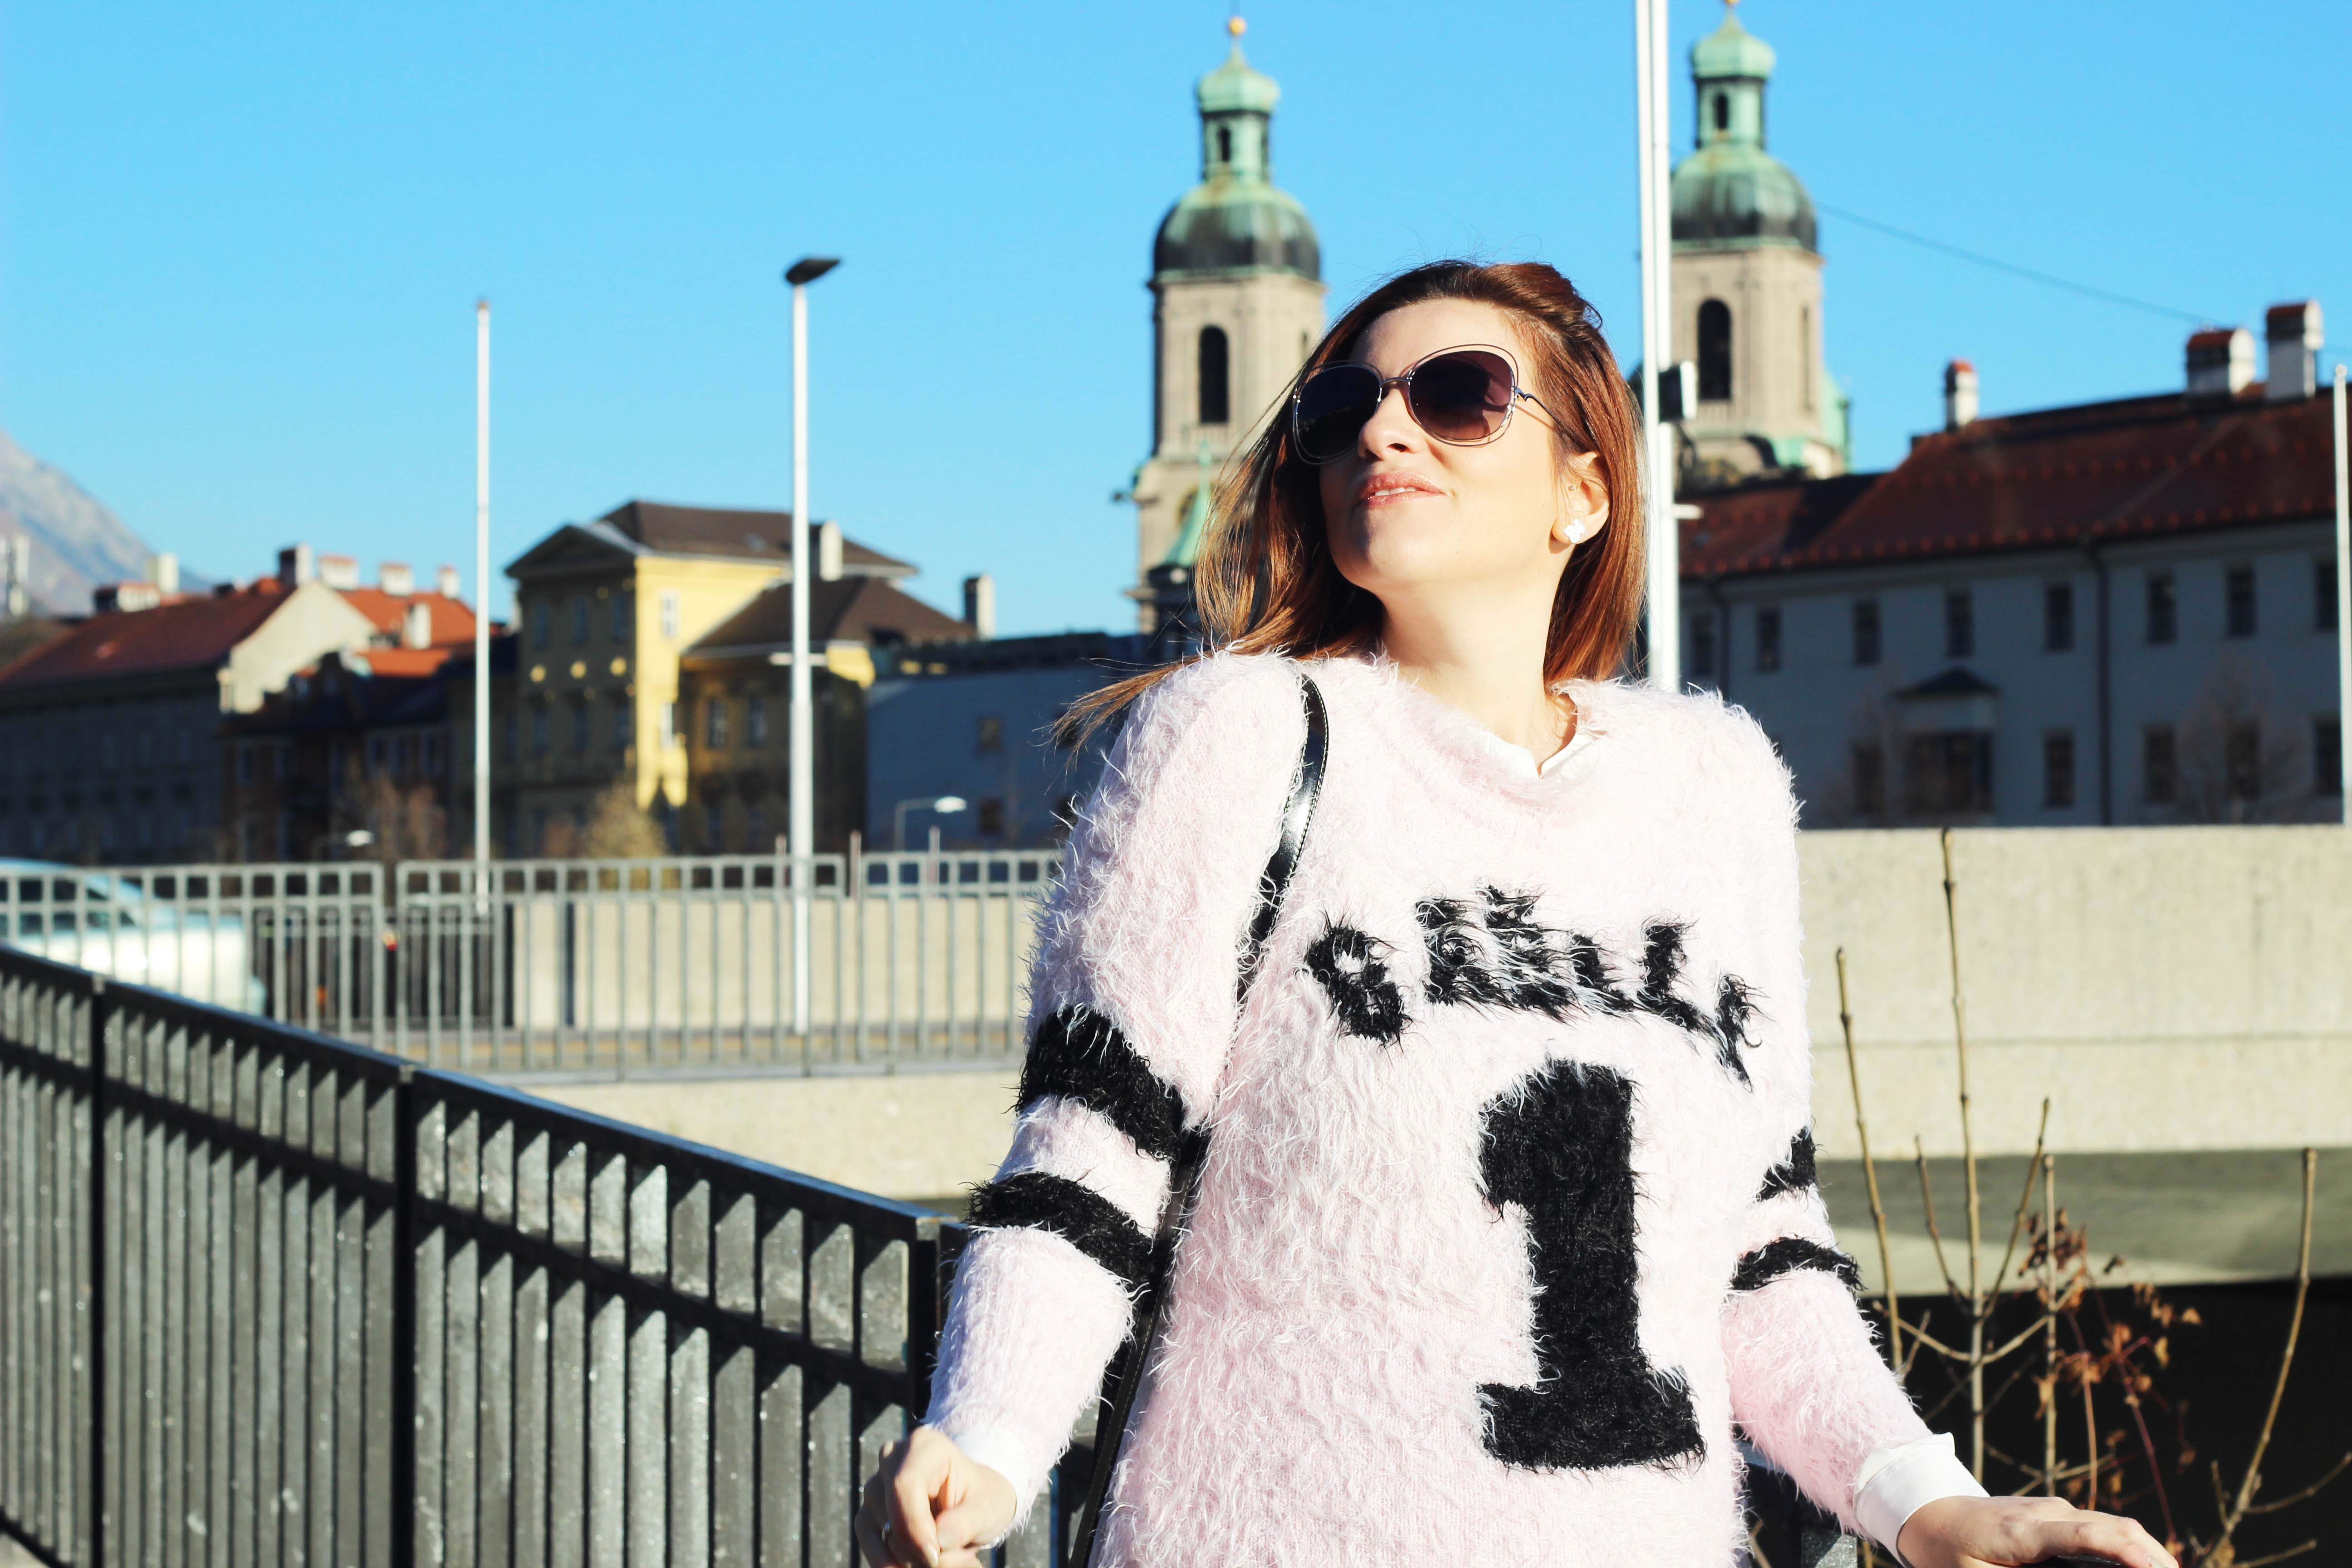 ELISABETTA BERTOLINI - PULLOVER - OUTFIT INVERNO gaelle bonheur